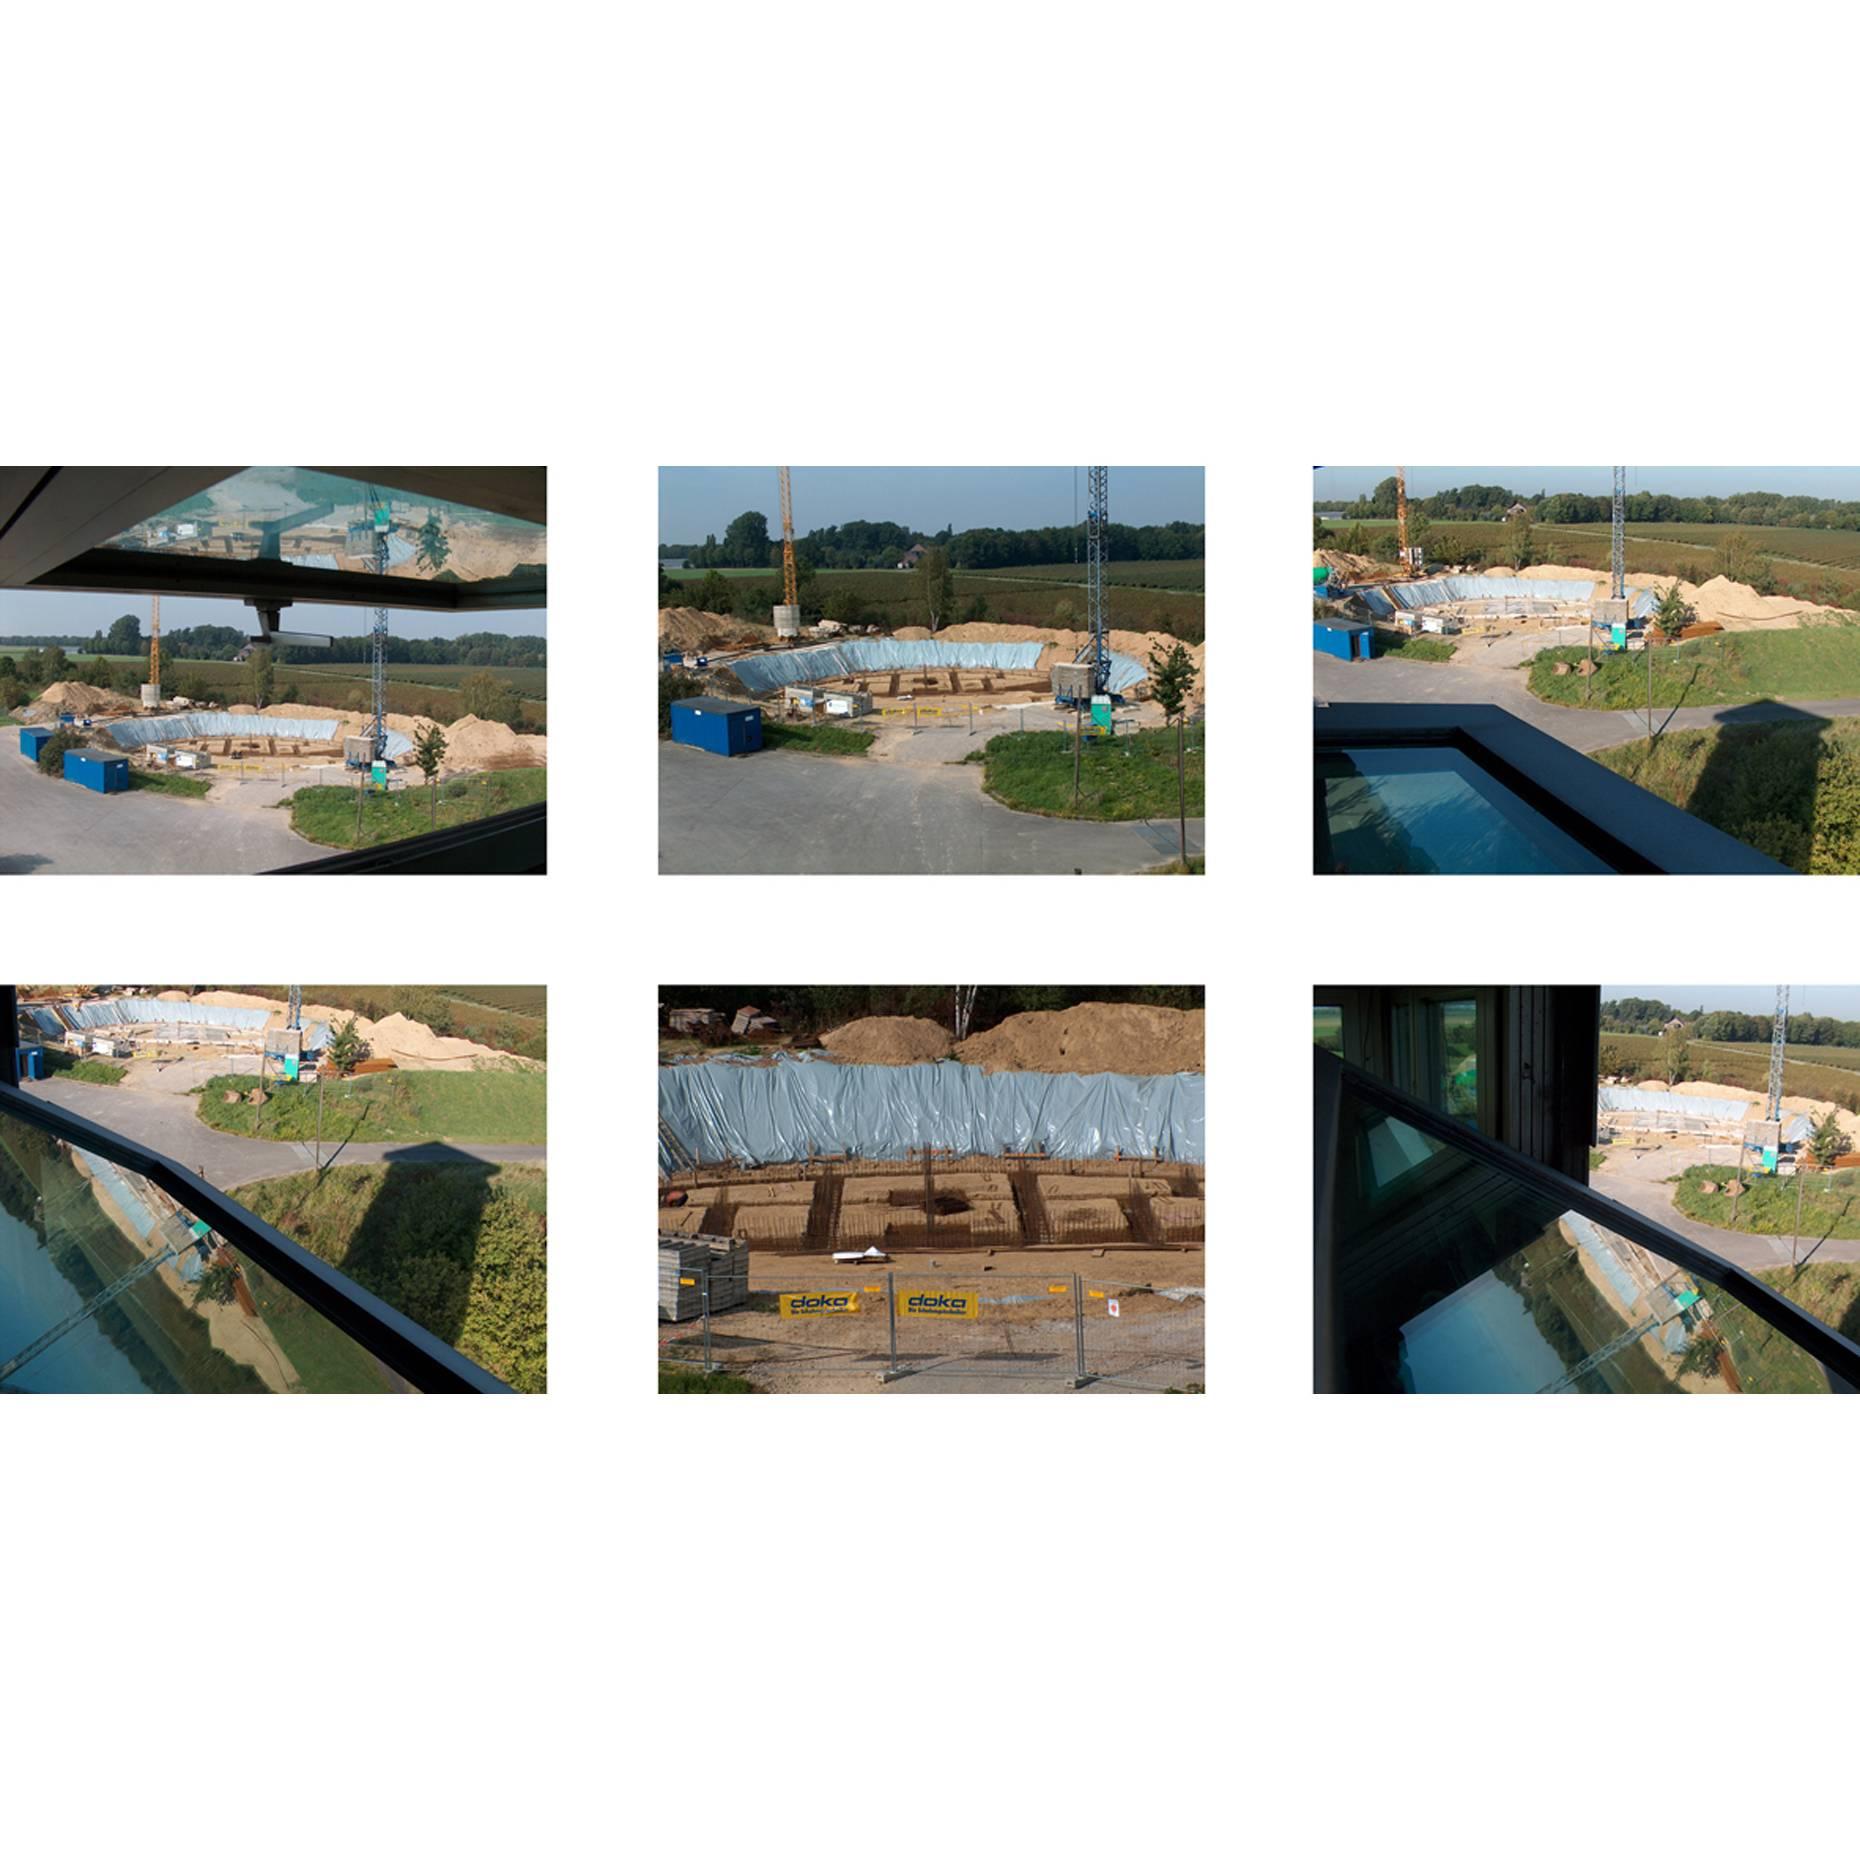 Haus für Musiker 2008 6tlg. Seq. Ultrachrome K3 Tinte a/Canson Infinity 210g/qm je Din A3